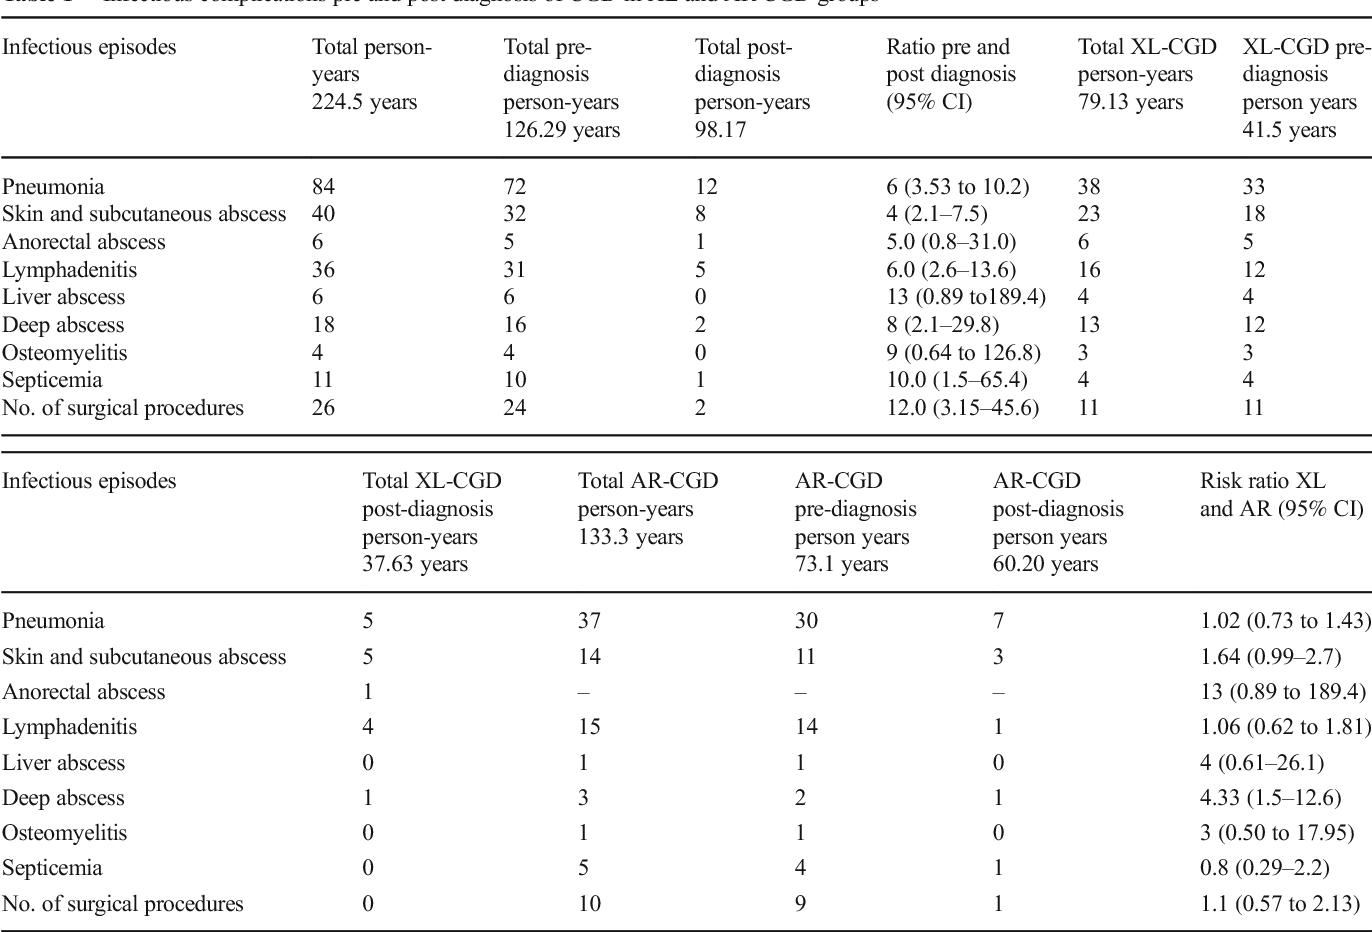 Infection Profile in Chronic Granulomatous Disease: a 23-Year